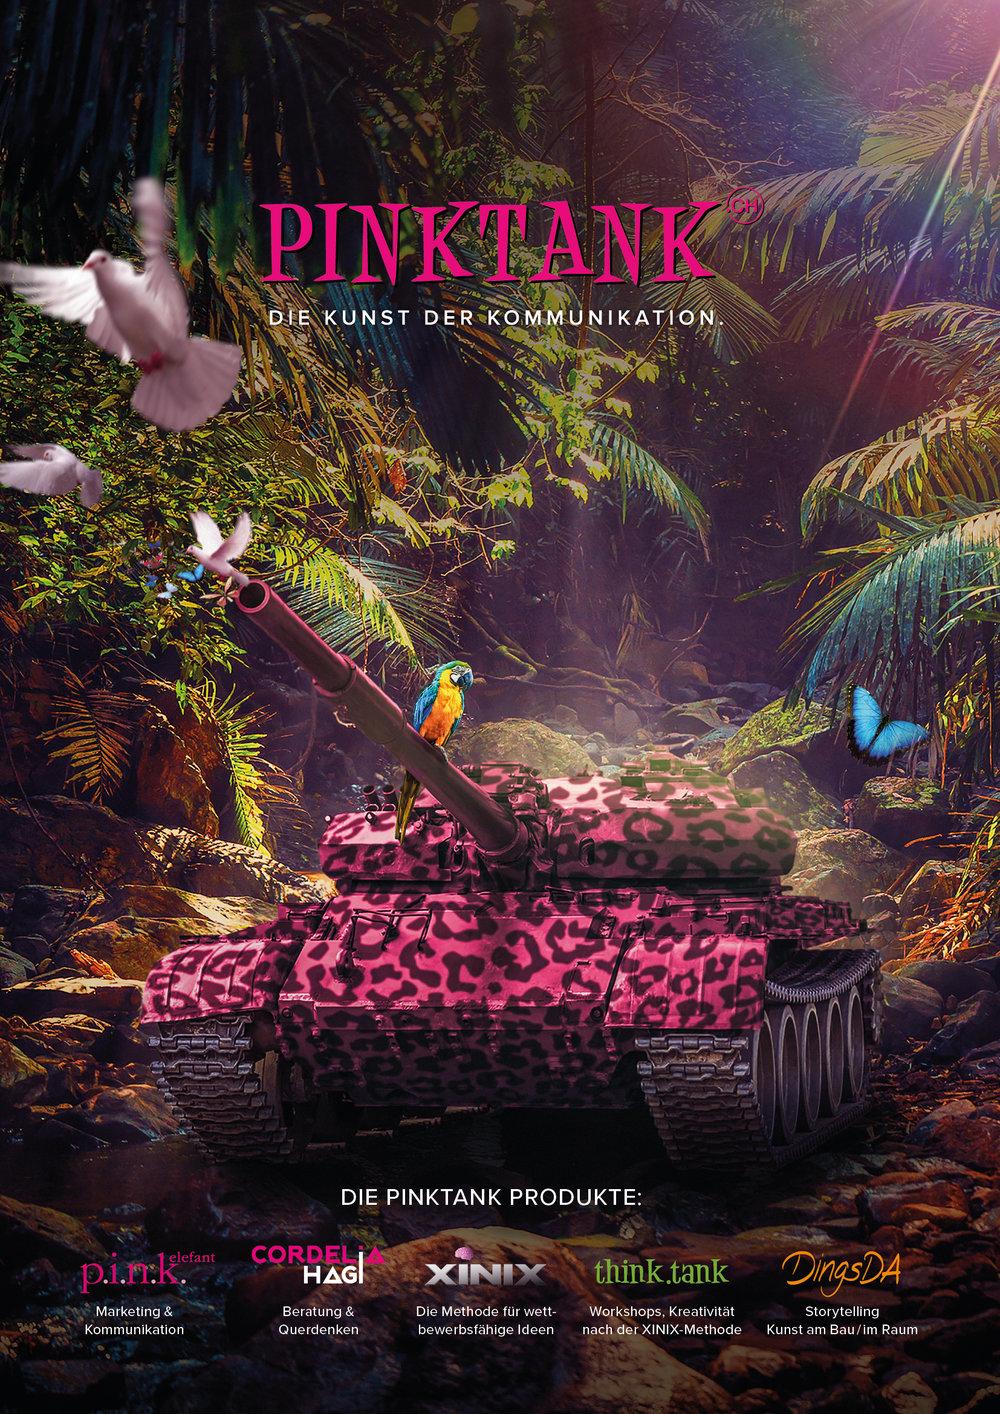 PINKTANK_Broschüre_Dokumentation_ew04.jpg